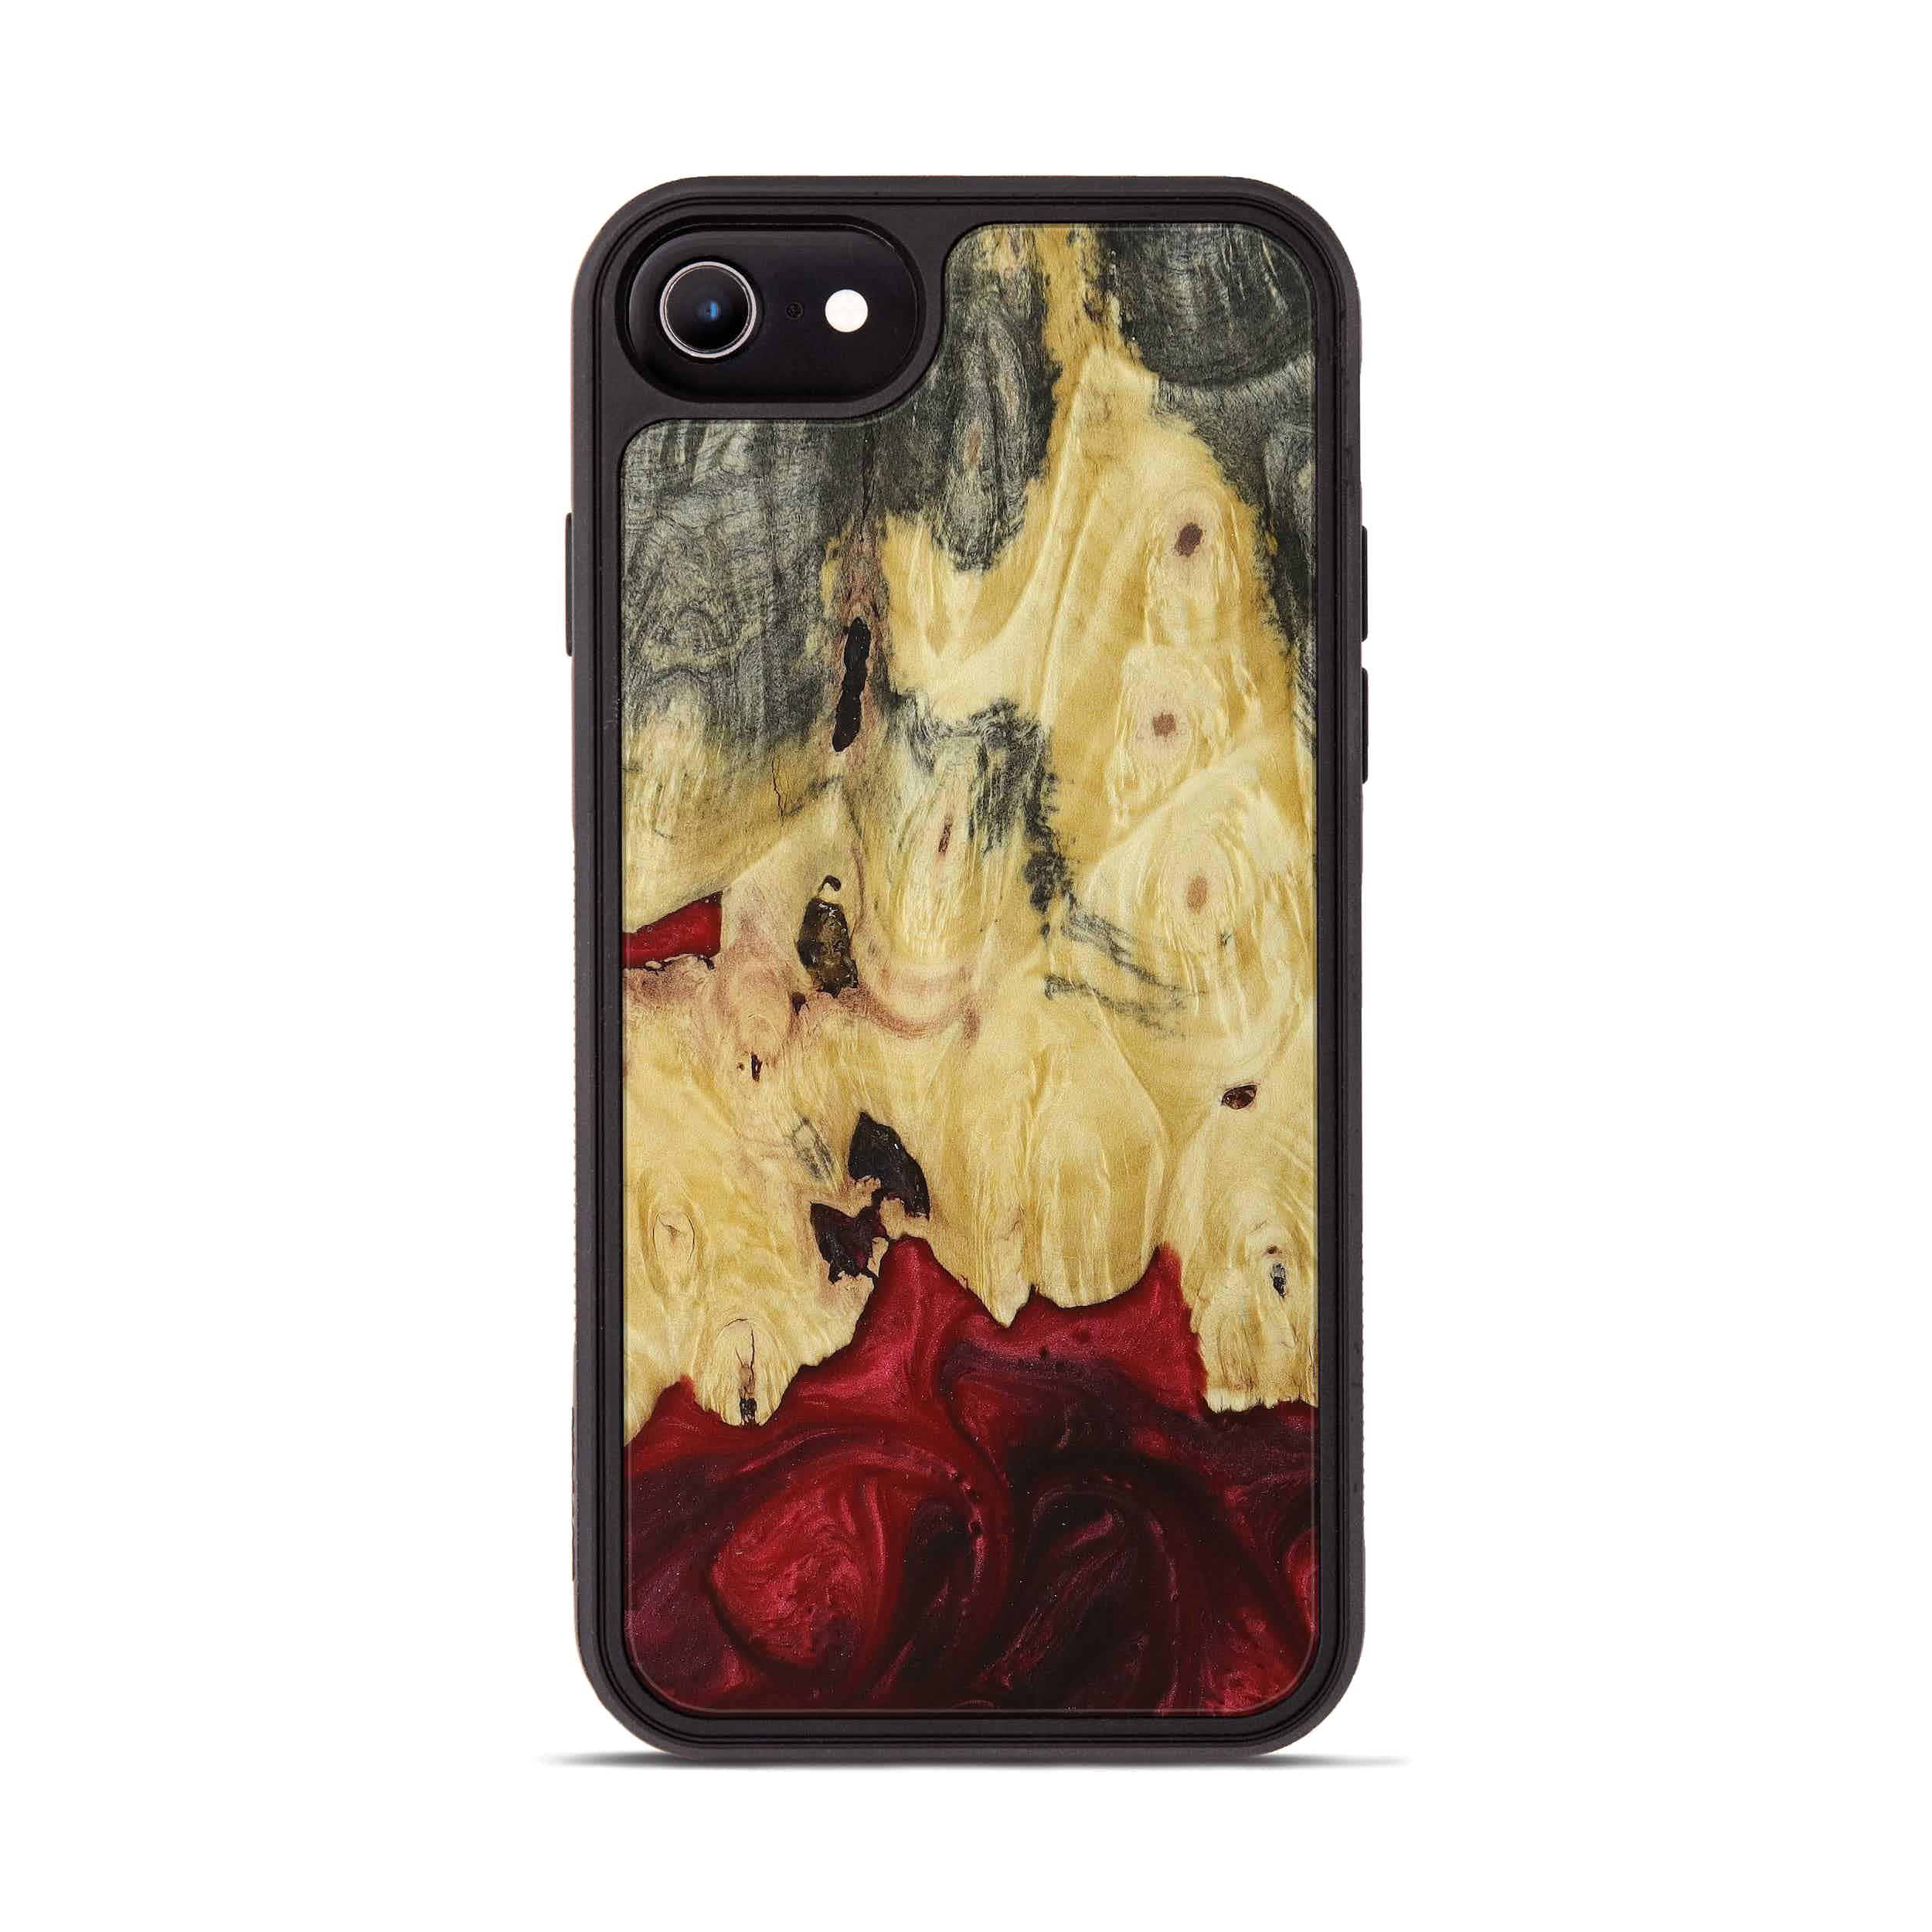 iPhone 6s Wood+Resin Phone Case - Dorri (Dark Red, 395924)